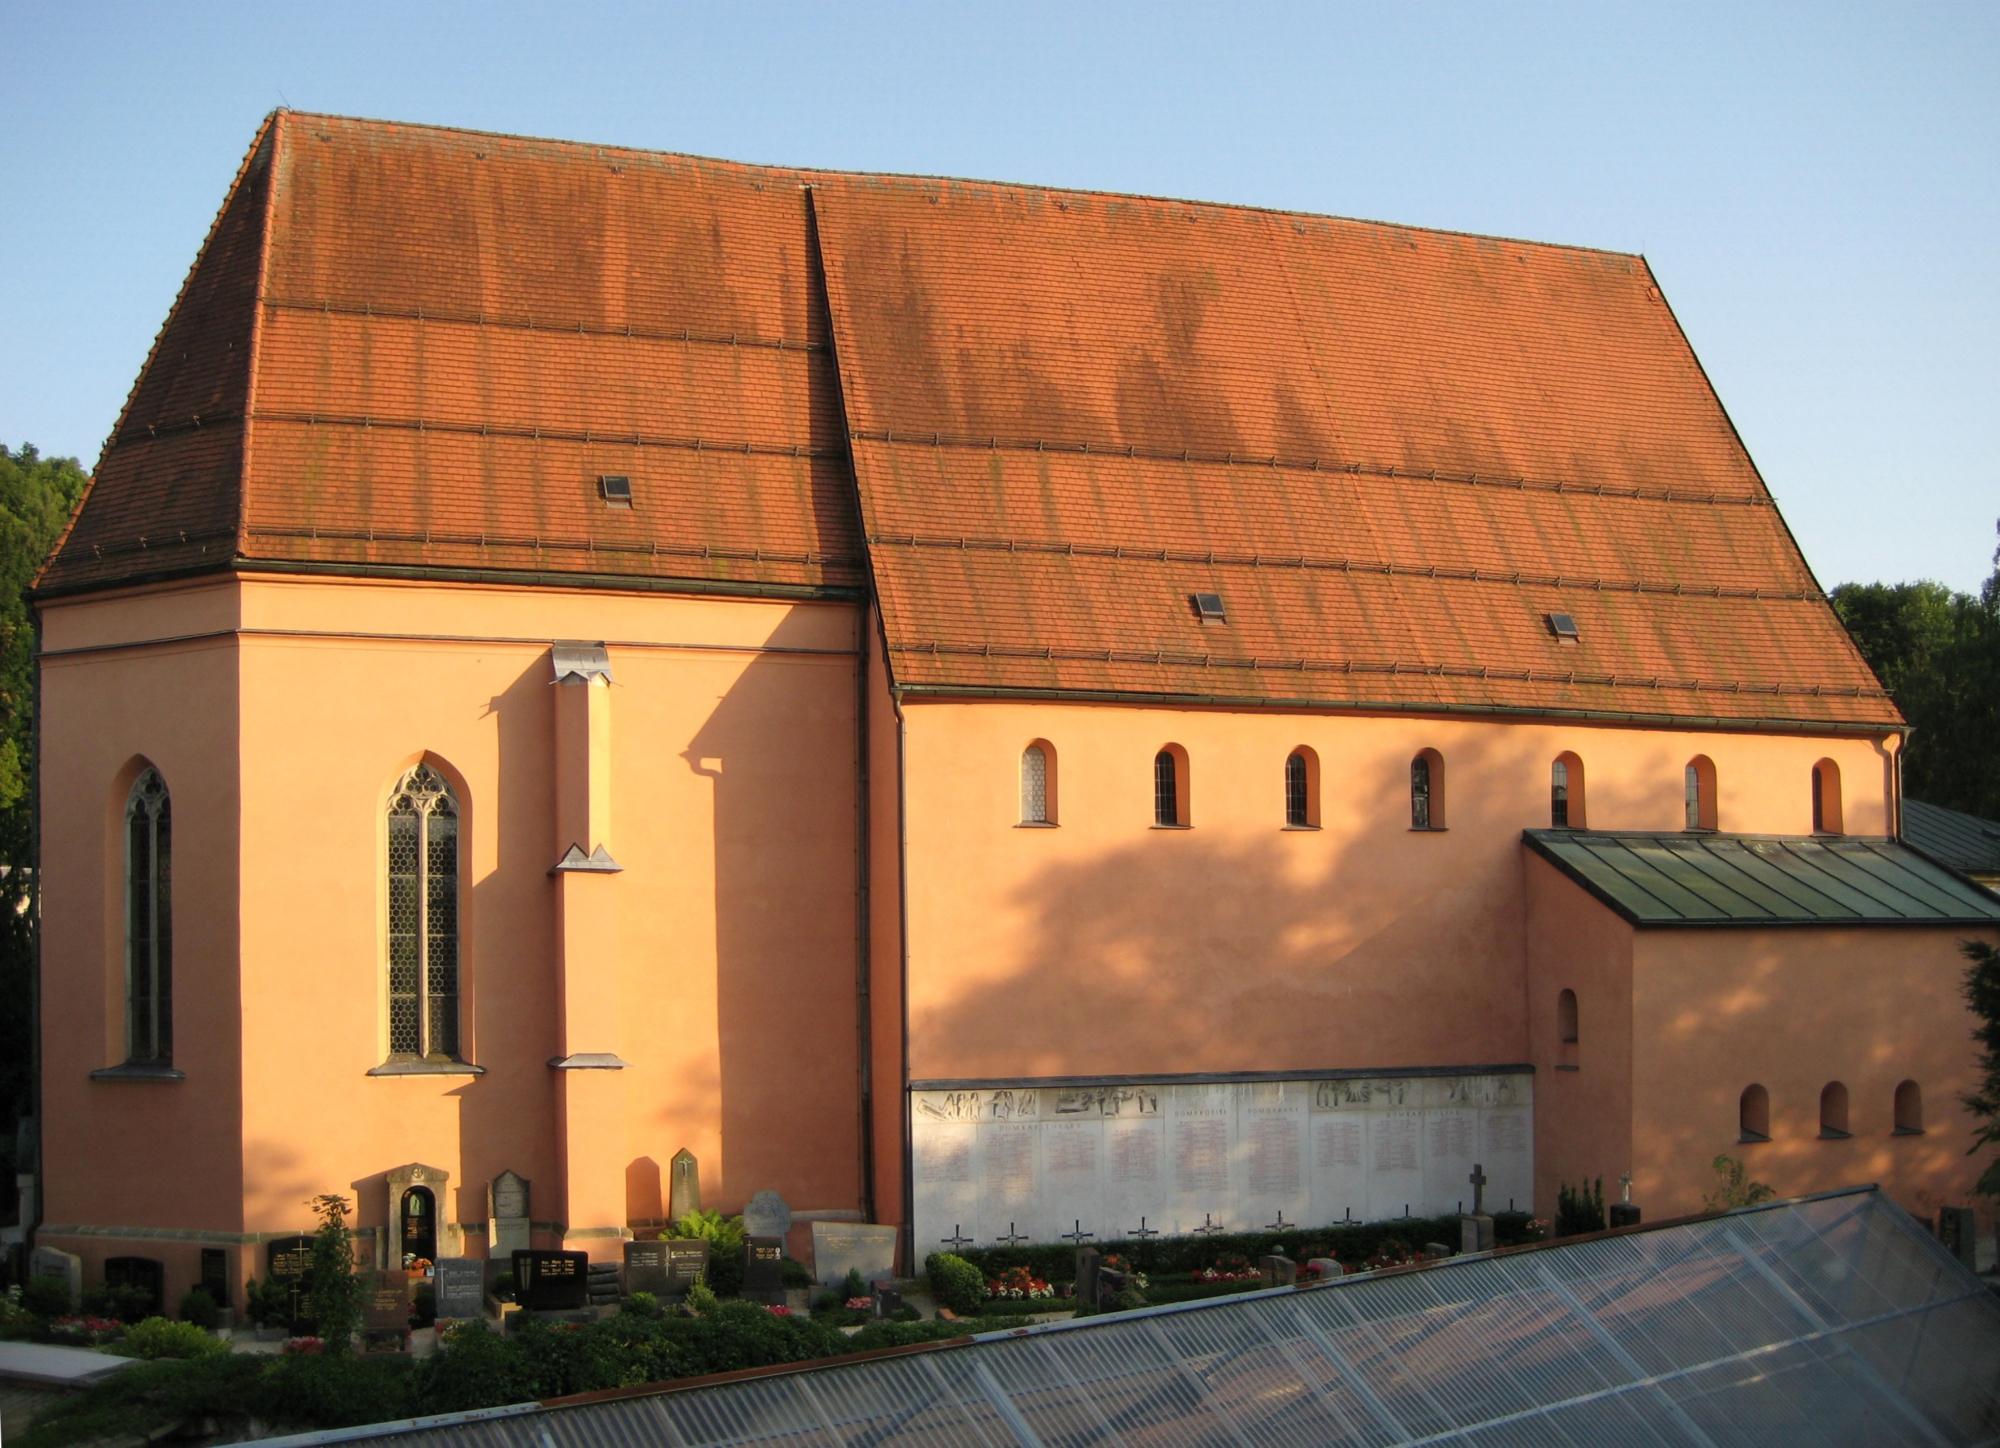 St Severin Passau 1 190121 165752